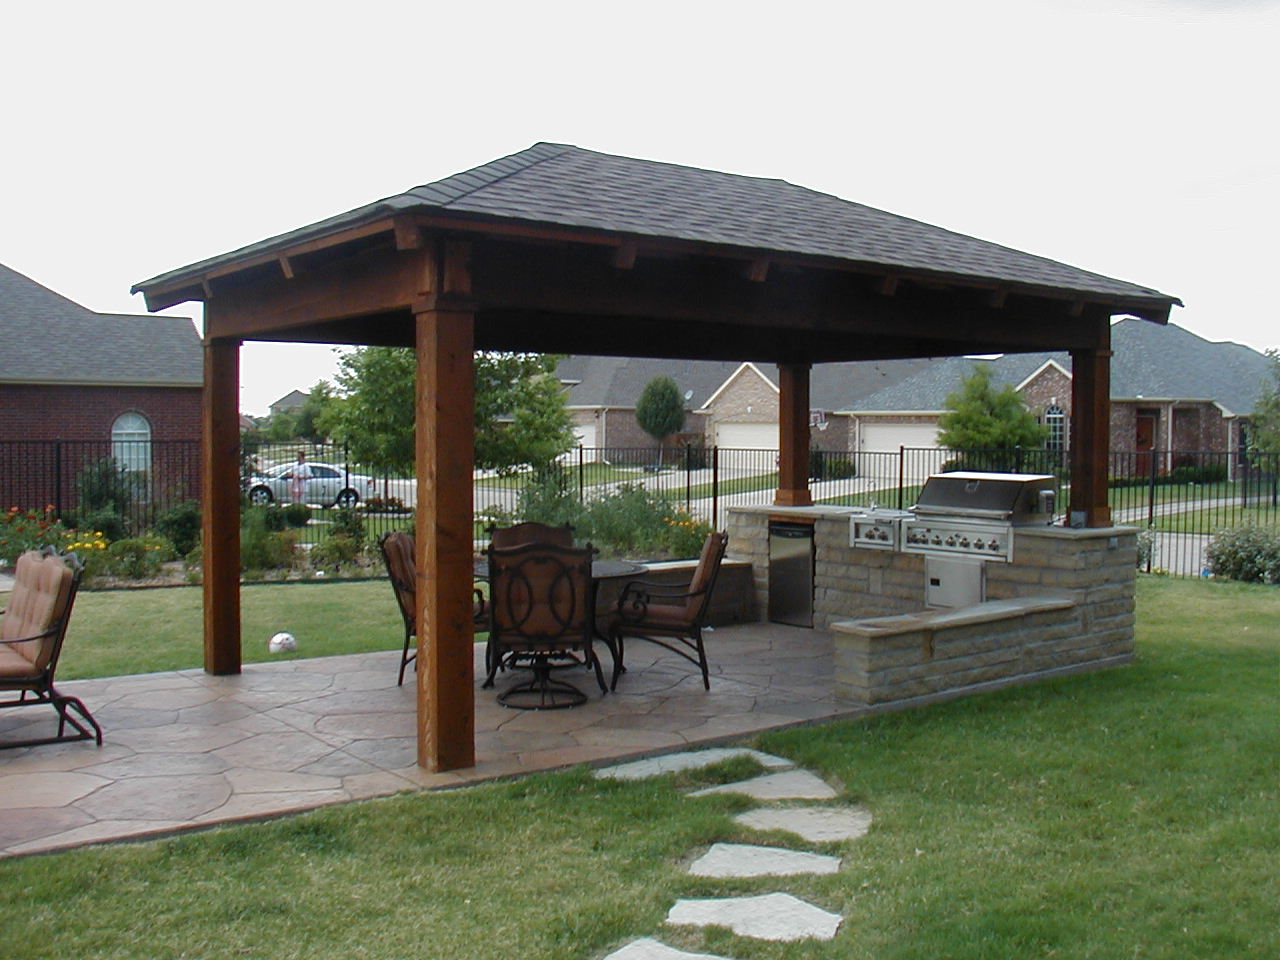 outdoor kitchen photos outdoor kitchen building and design. Black Bedroom Furniture Sets. Home Design Ideas